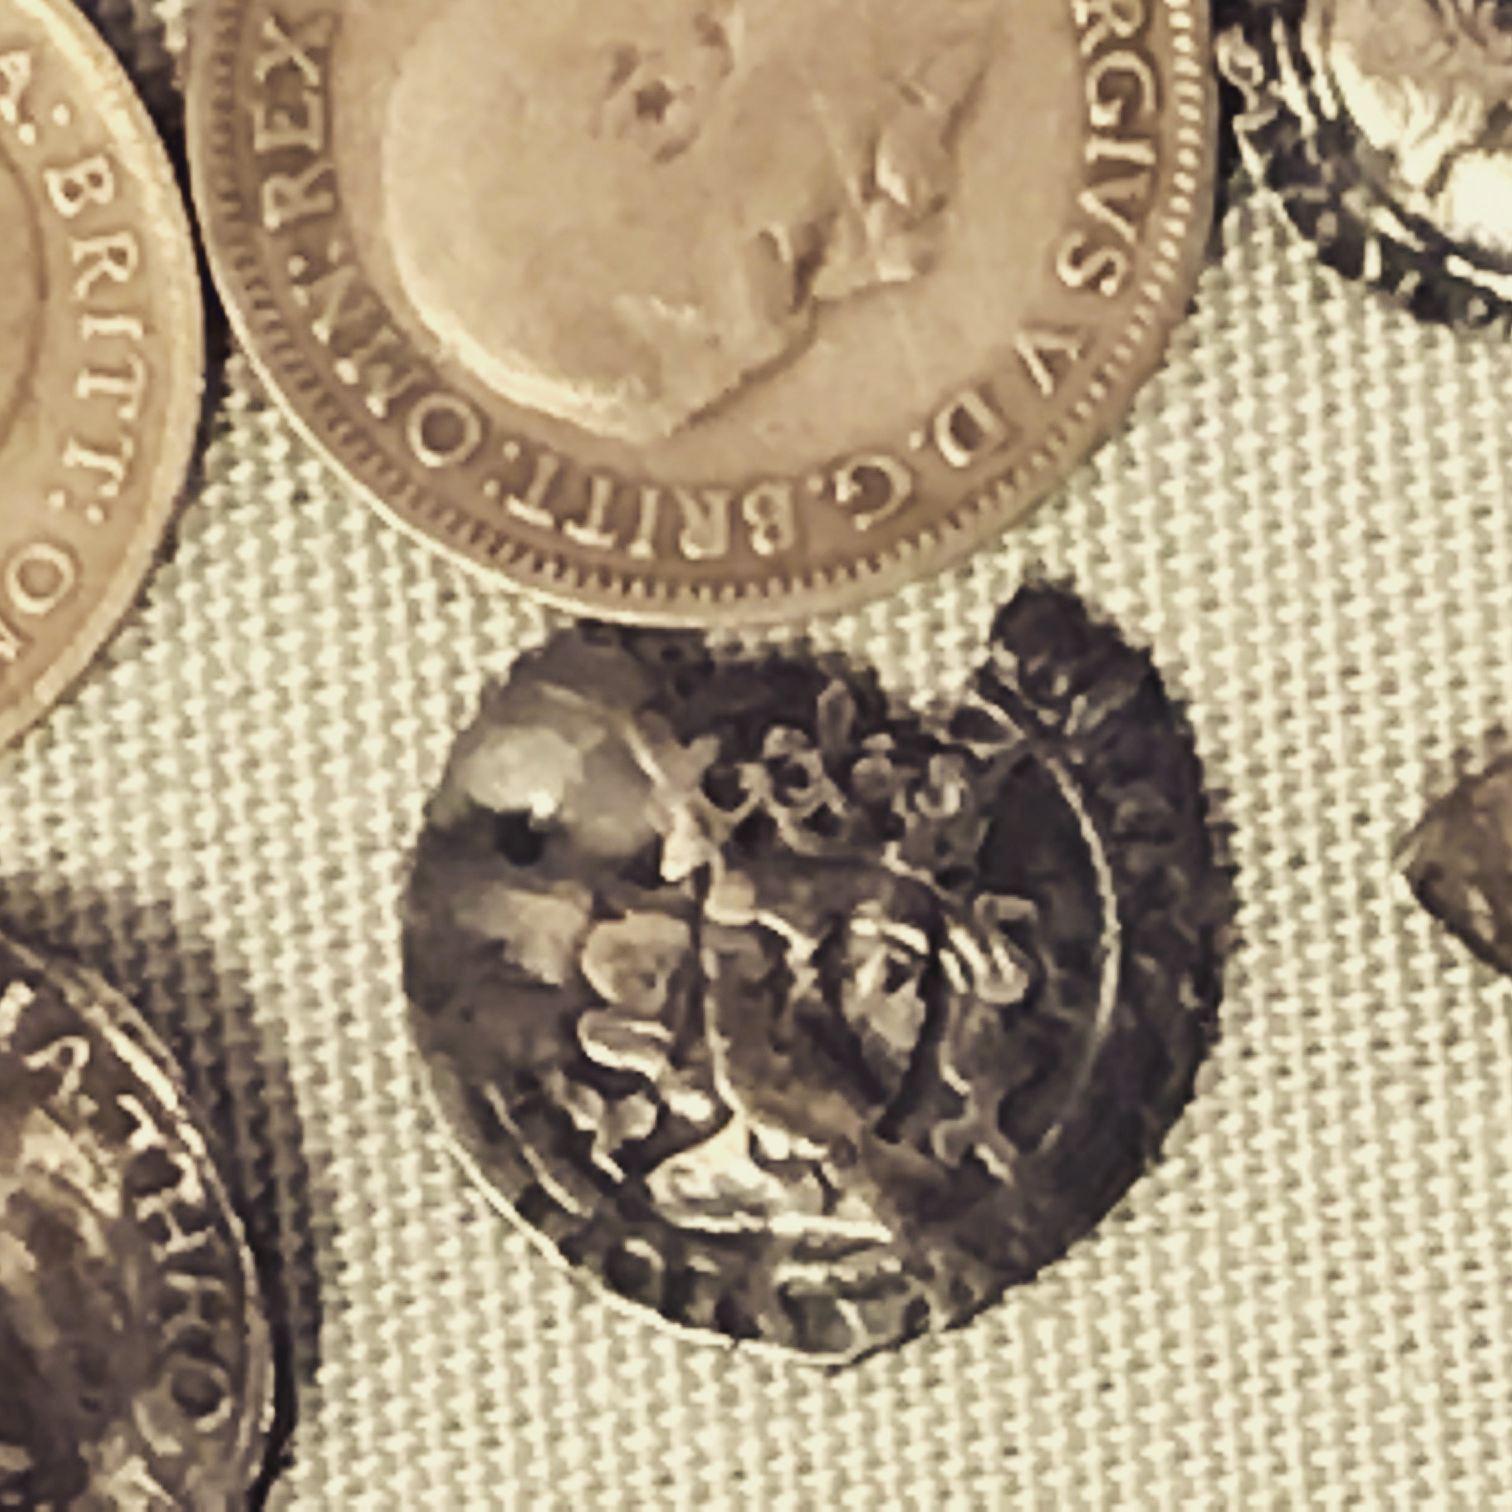 Ancient Artefacts copyright Ludlow Museum